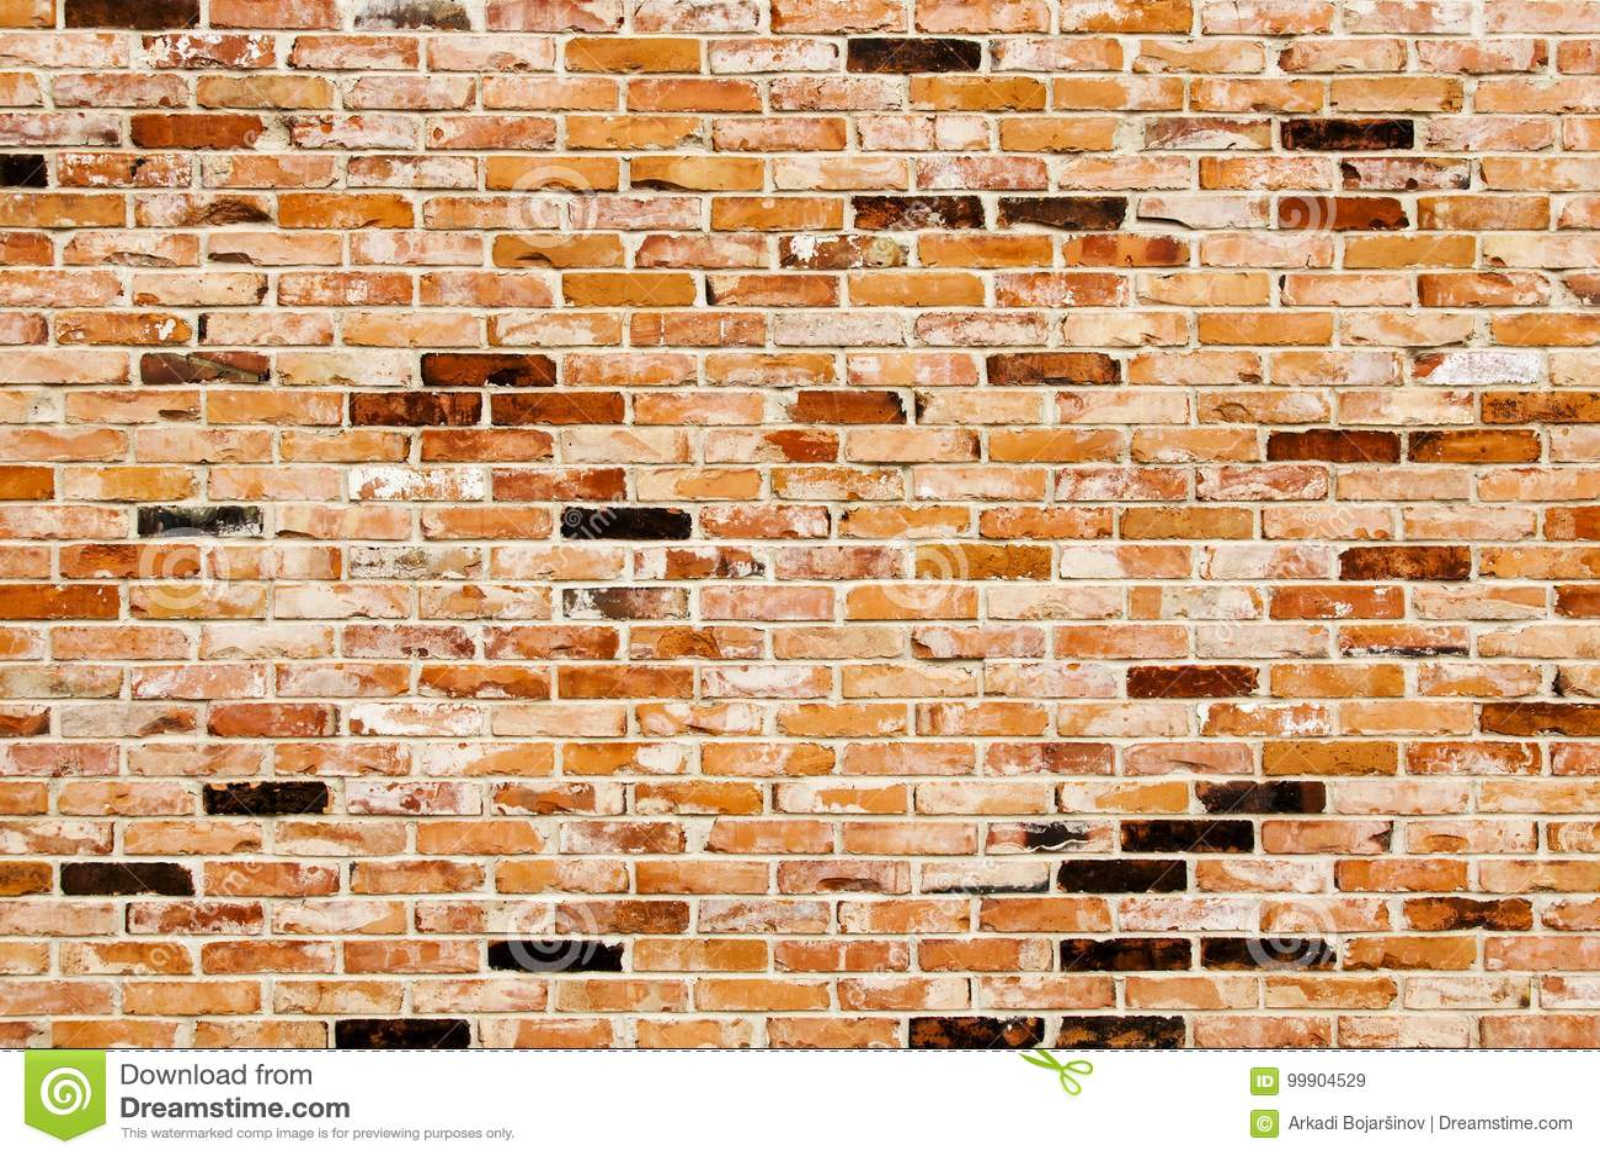 Brickwall stone background